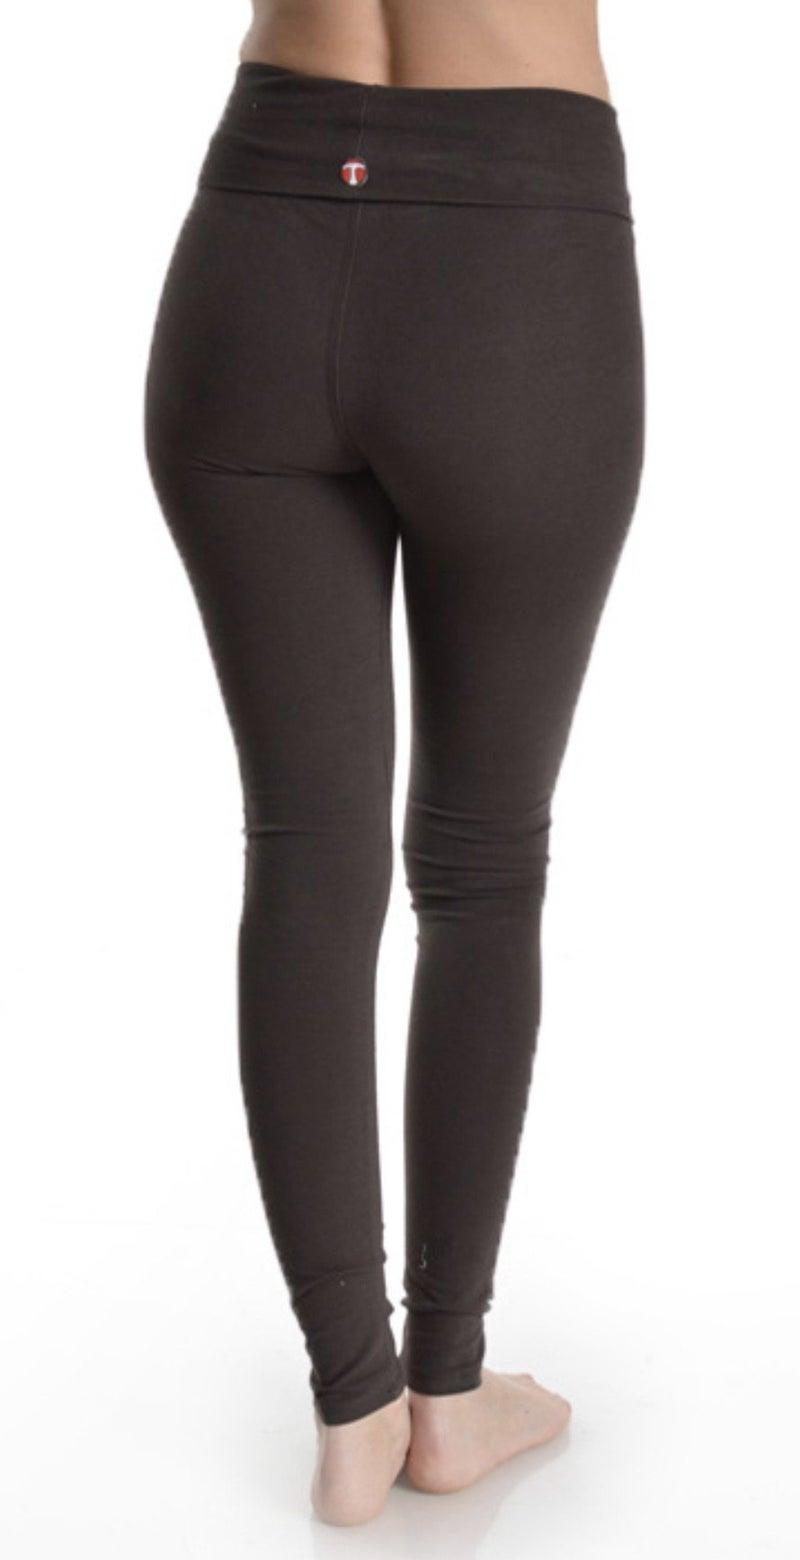 Classic Black Fold Over Leggings